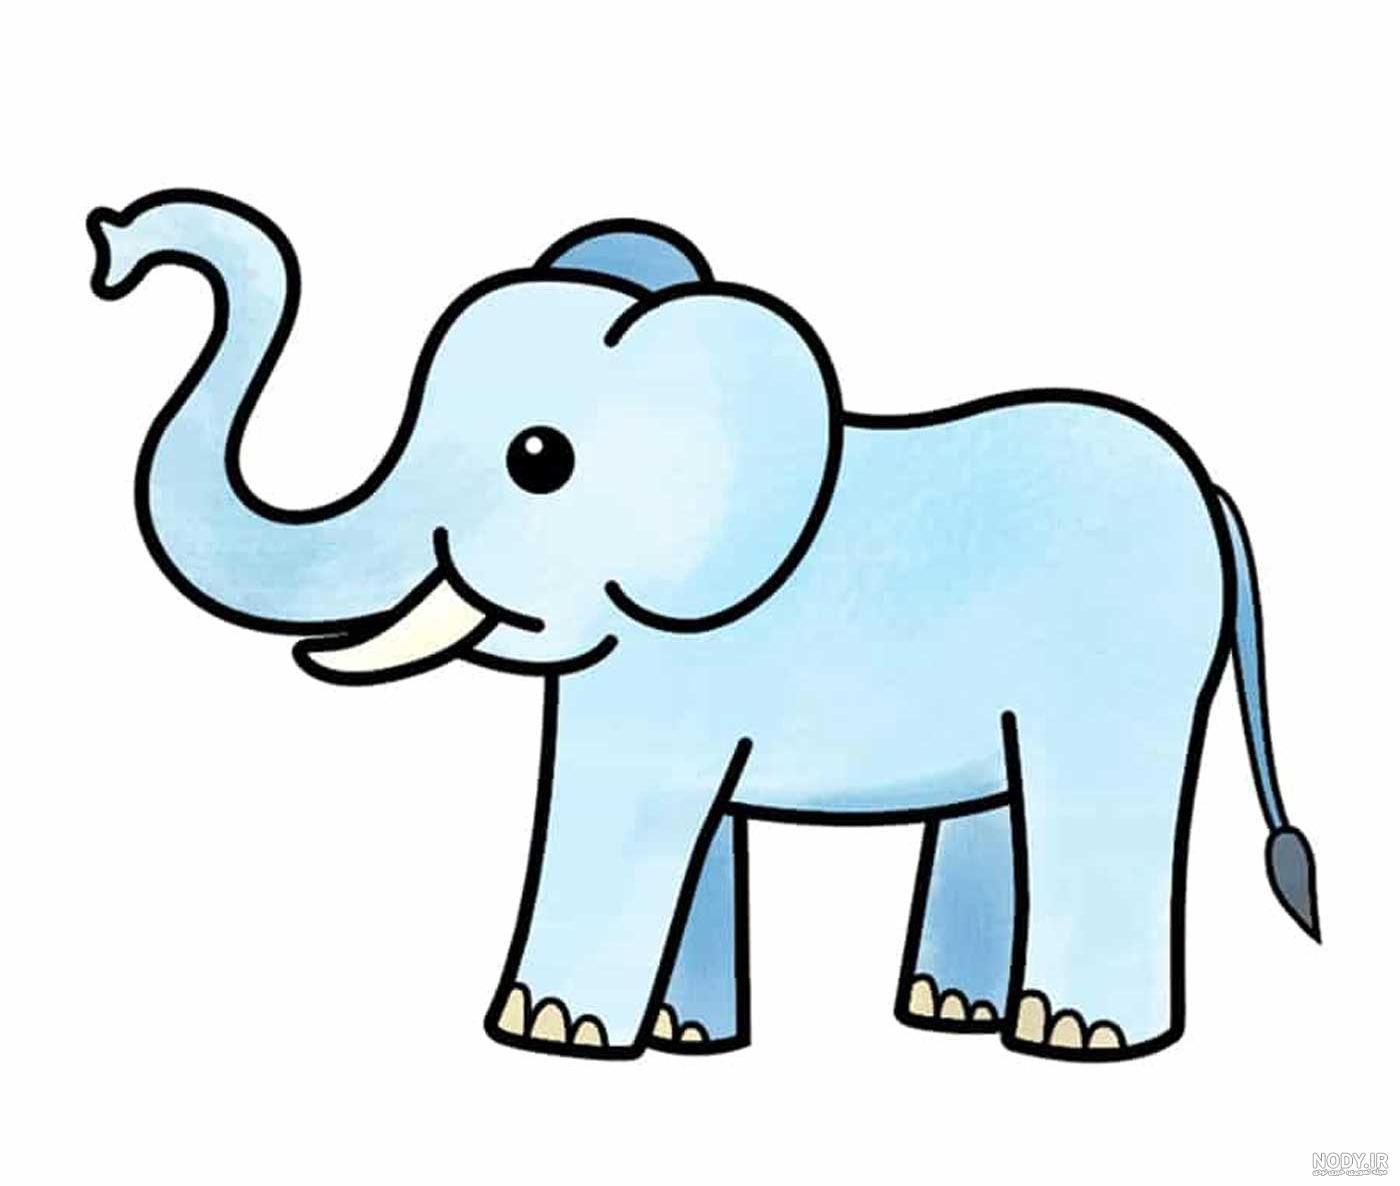 عکس نقاشی فیل کودکانه